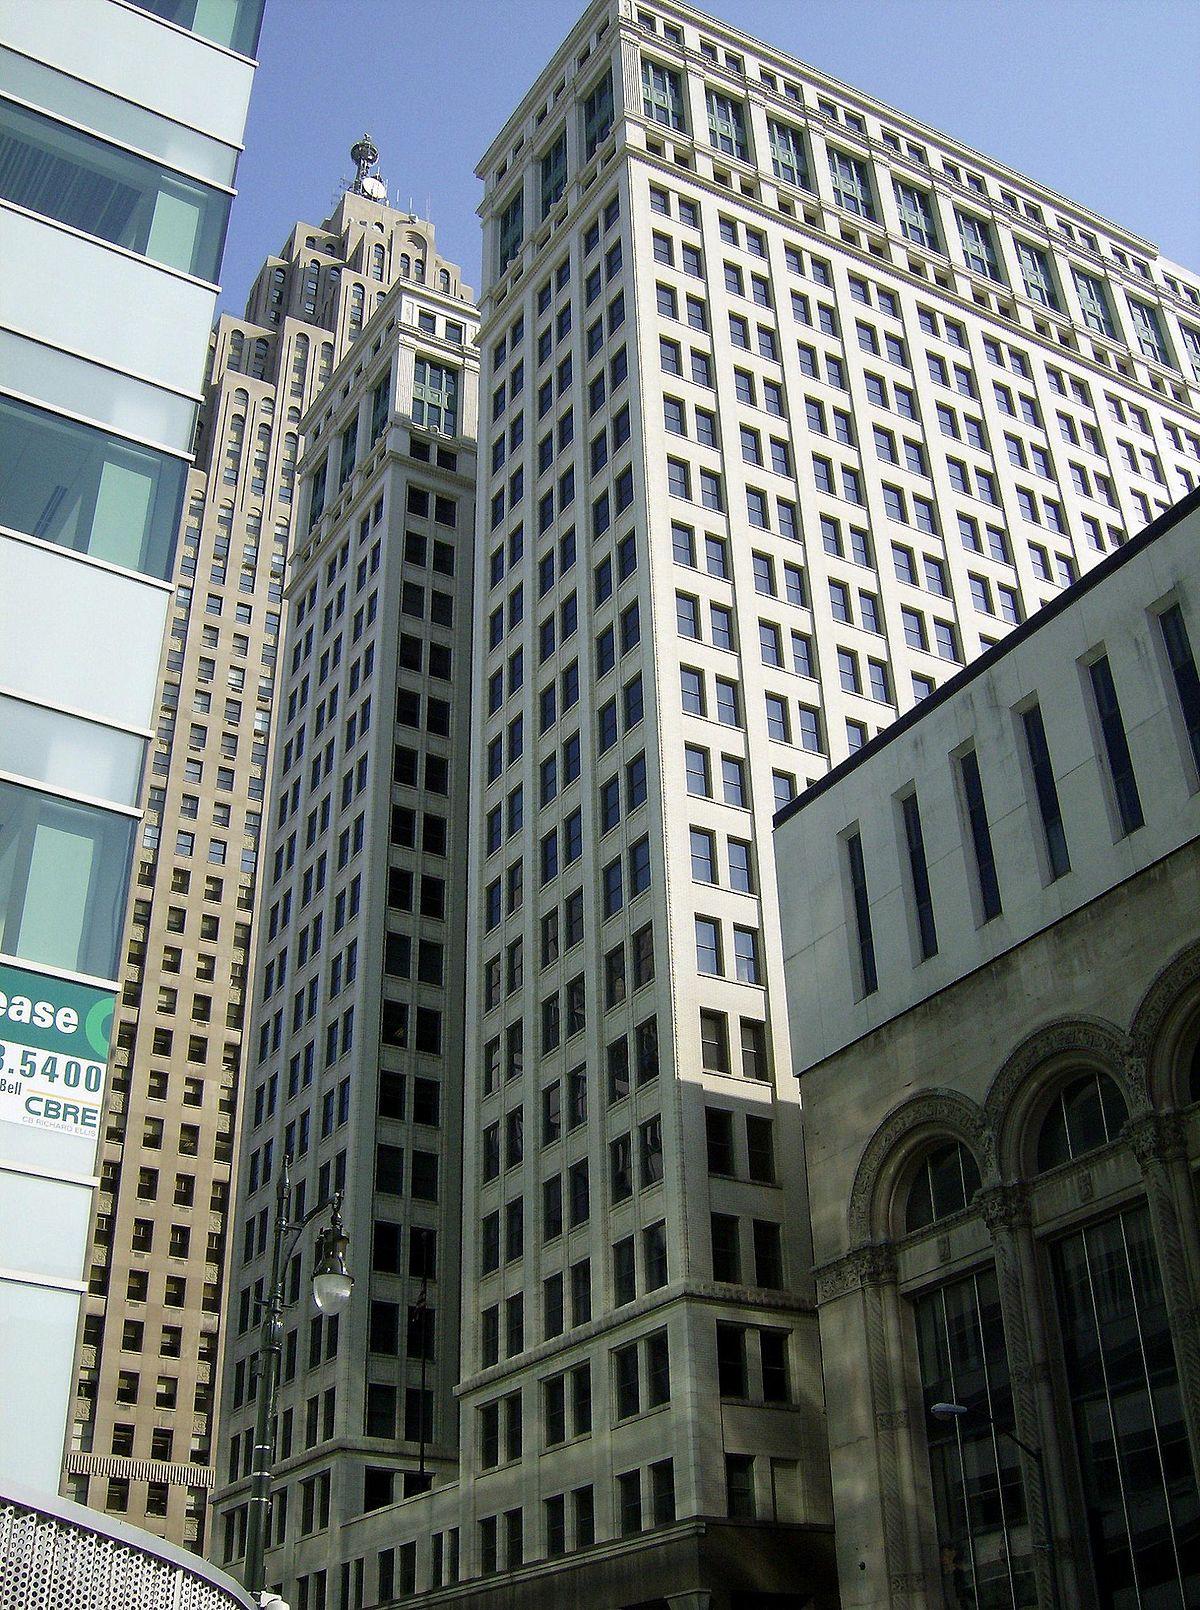 detroit building chrysler architecture buildings dime downtown michigan district neoclassical metropolitan skyscrapers burnham daniel wikipedia dodge tallest offices architect wallpapers